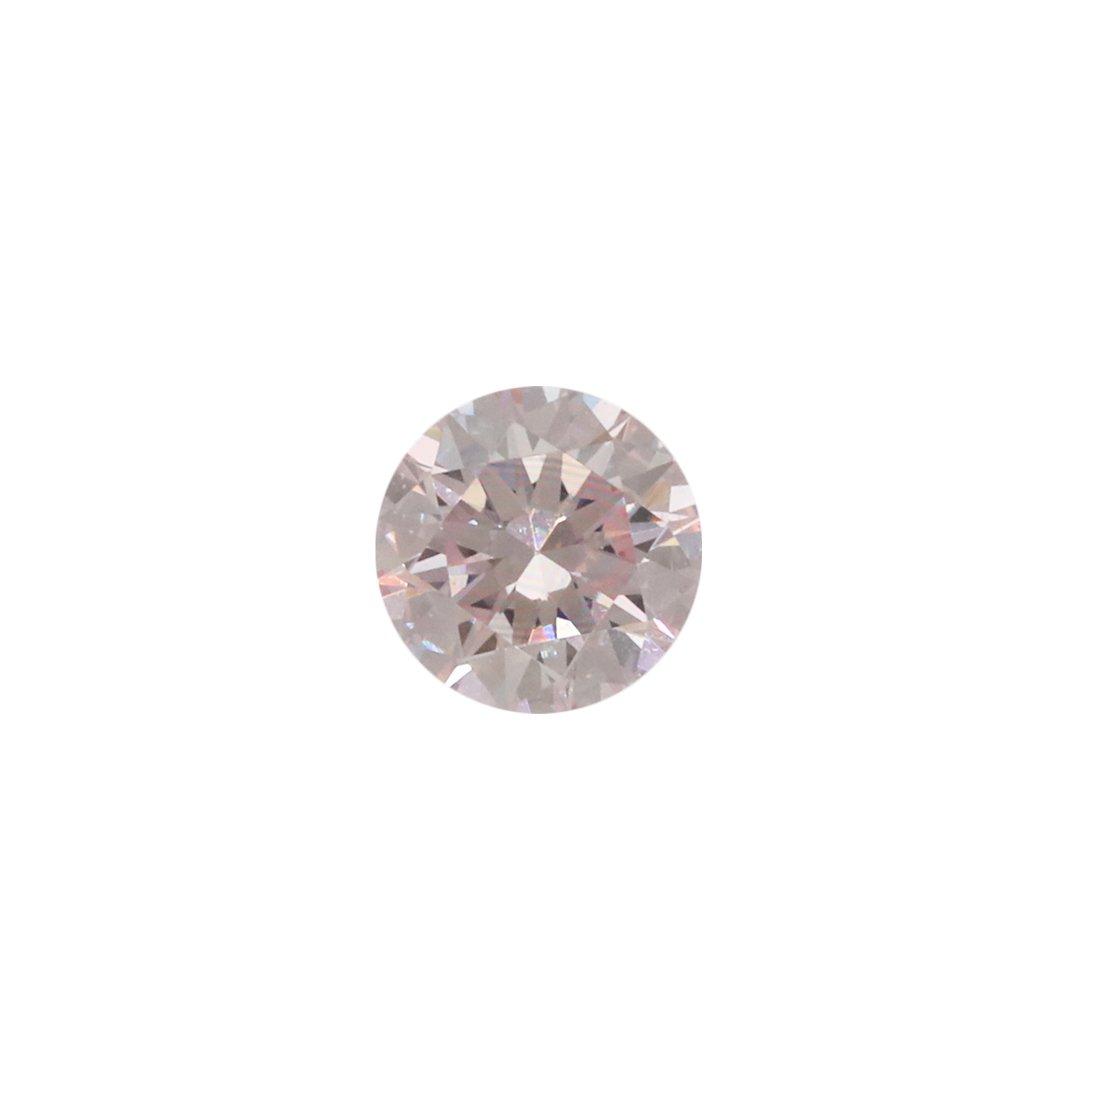 0.15ct Natural Fancy Light Pink, 8P, VVS1, Argyle Pink Diamond